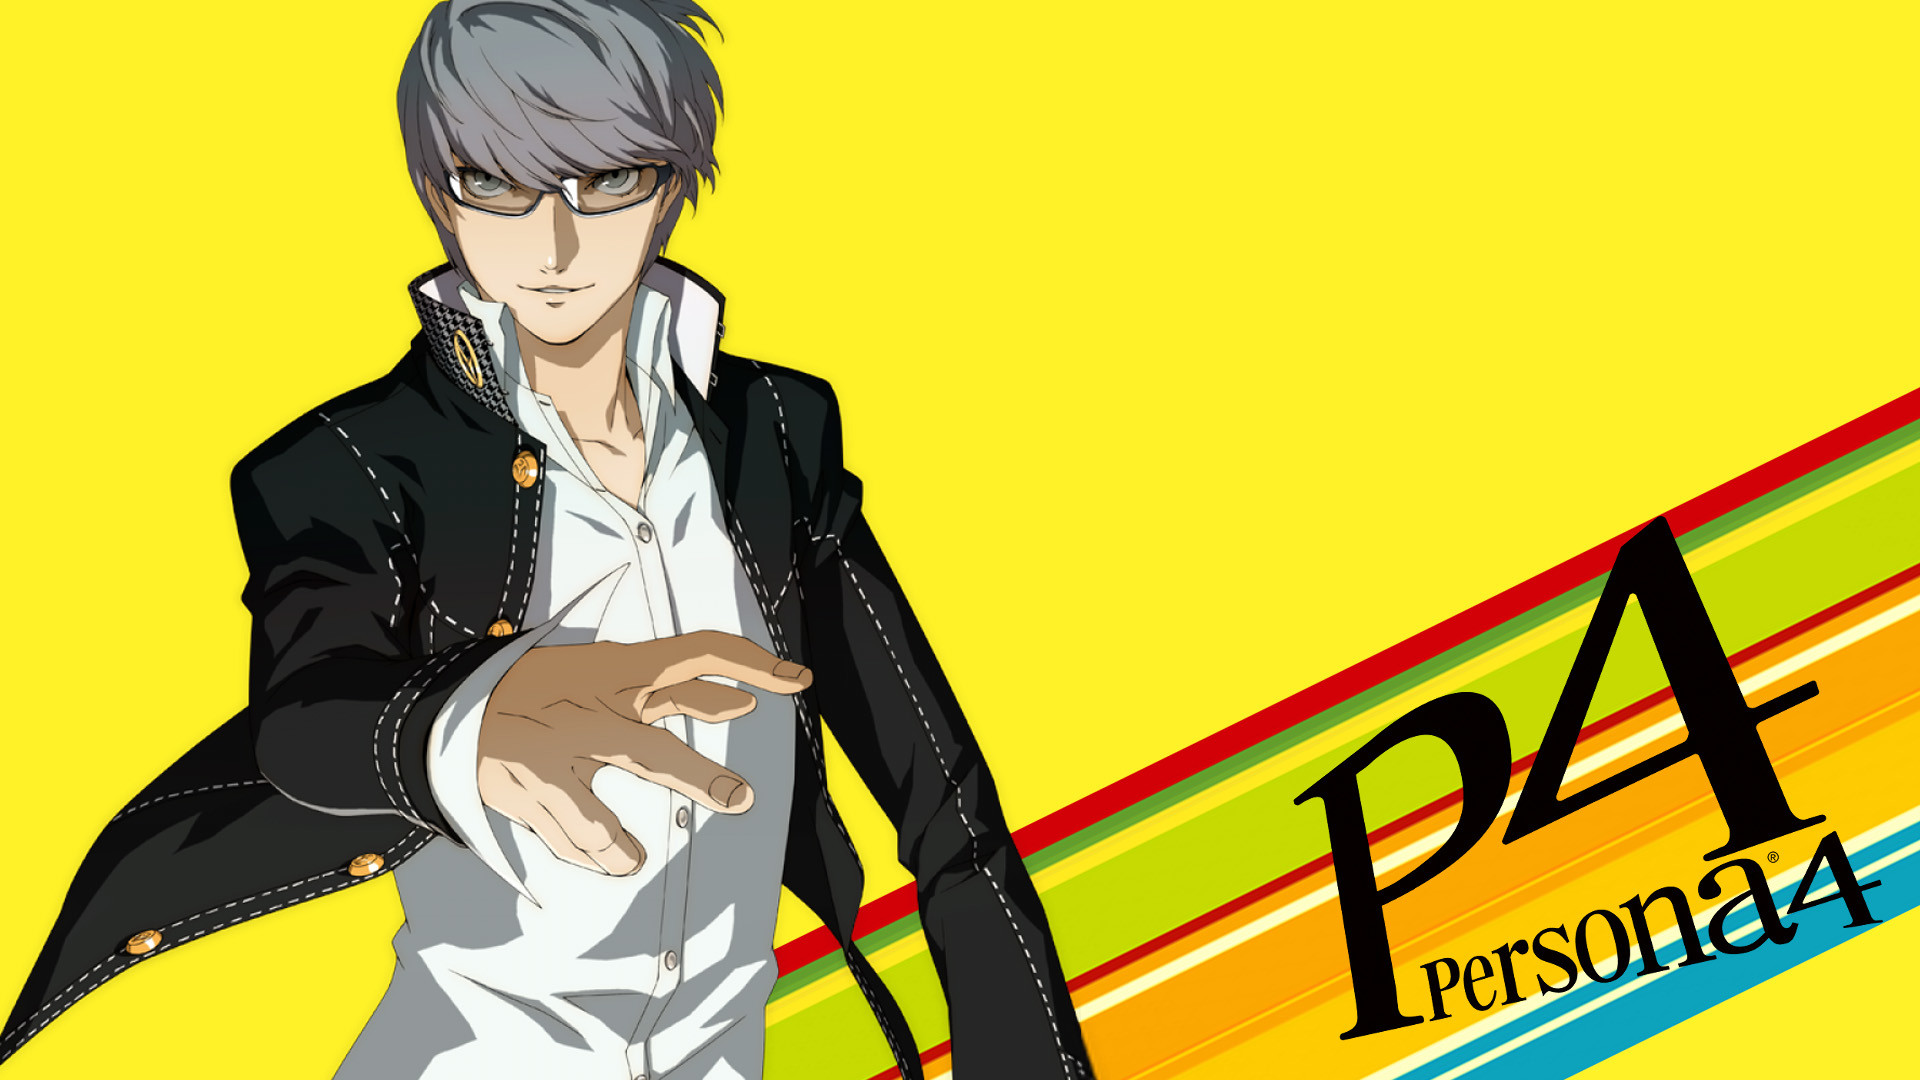 Yet another Narukami Yu Persona 4 wallpaper …